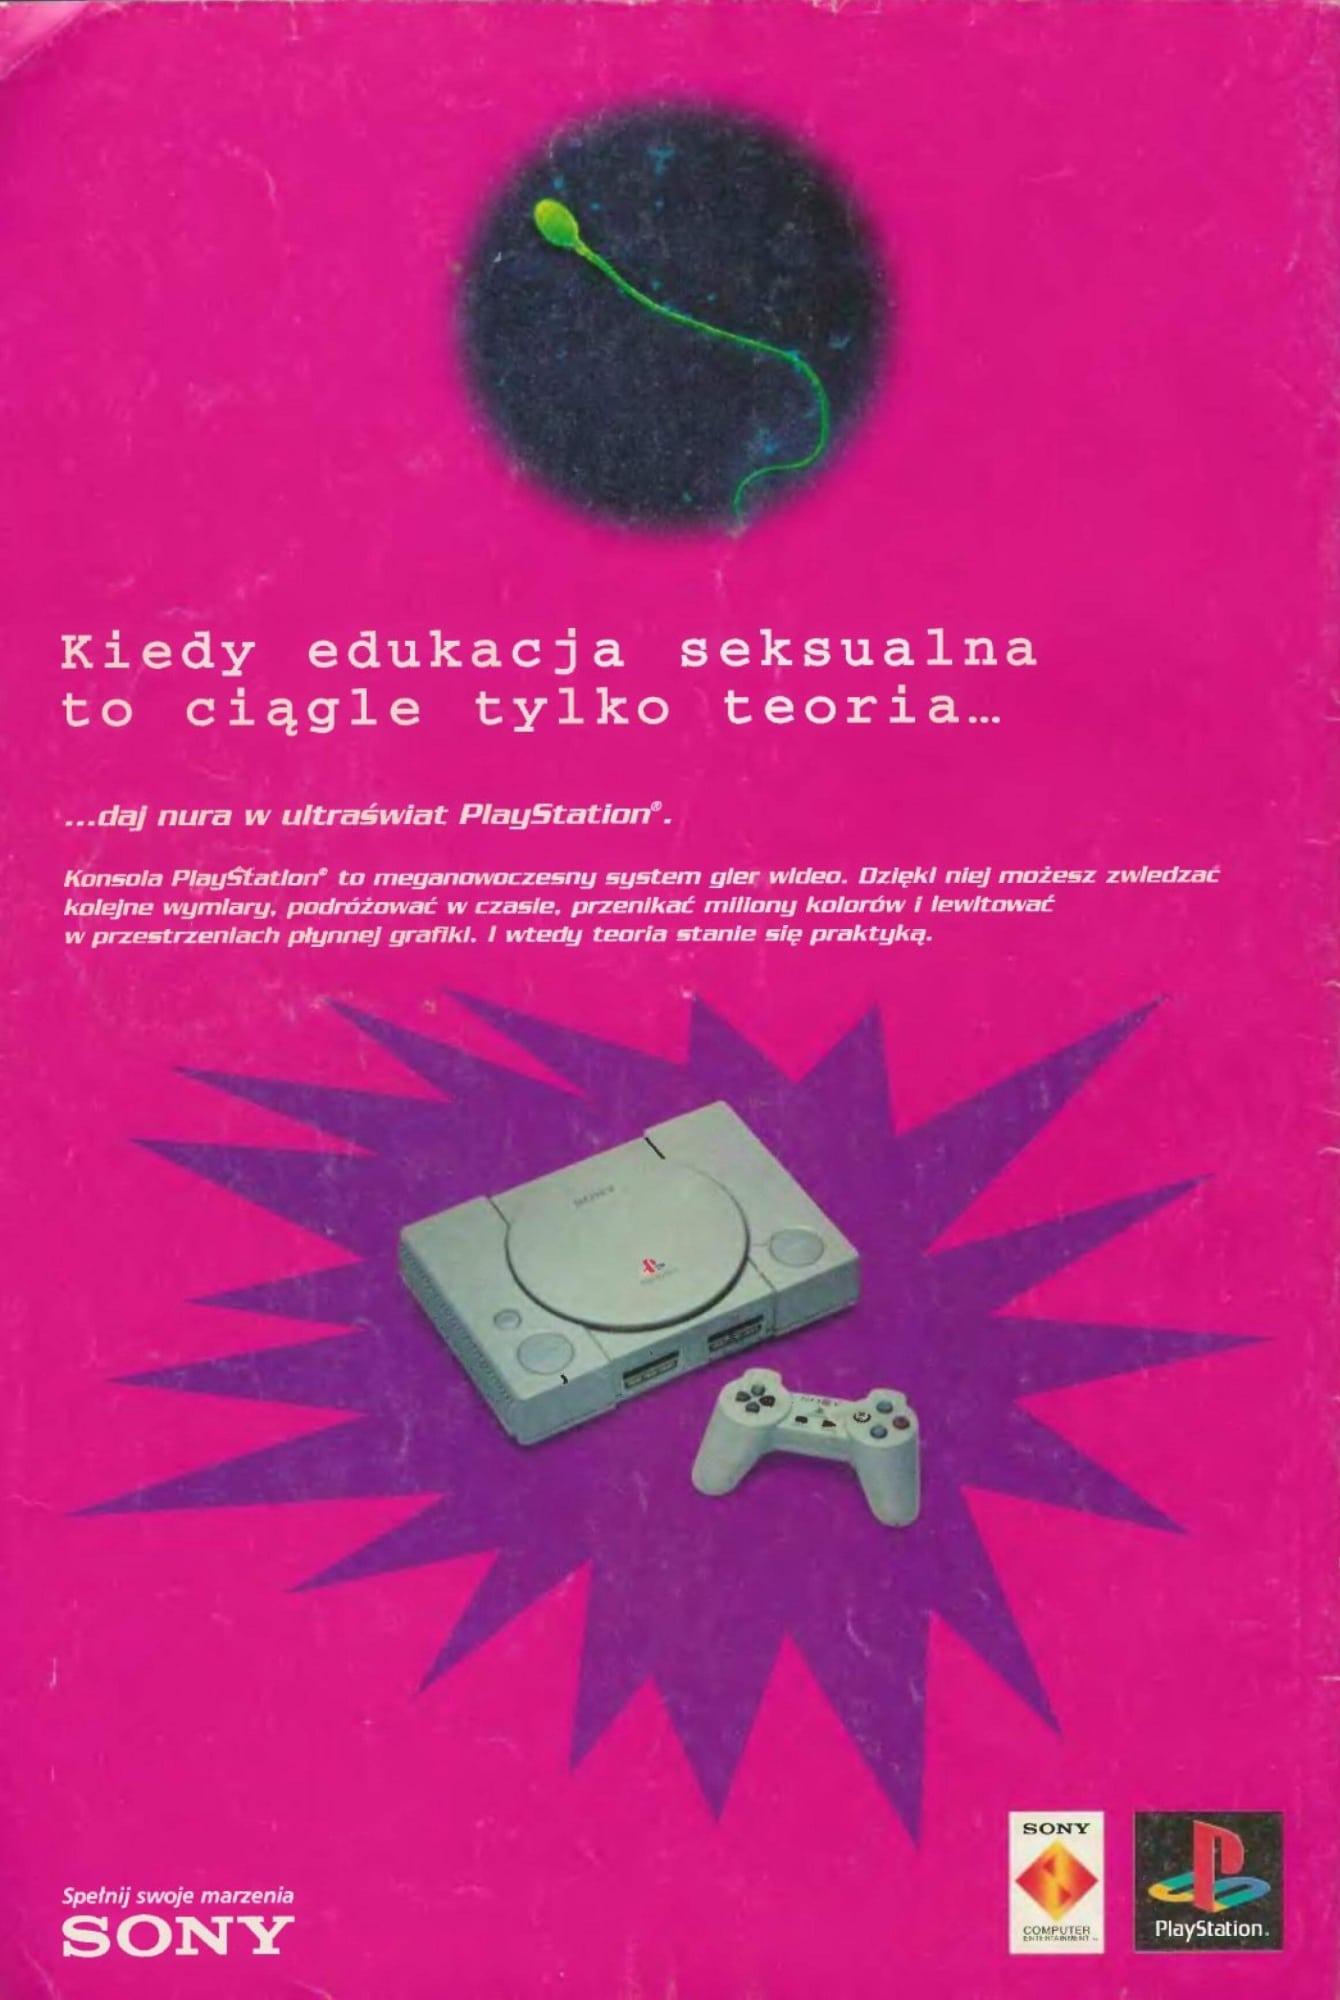 historia_playstation_w_polsce_10_ss_12_96